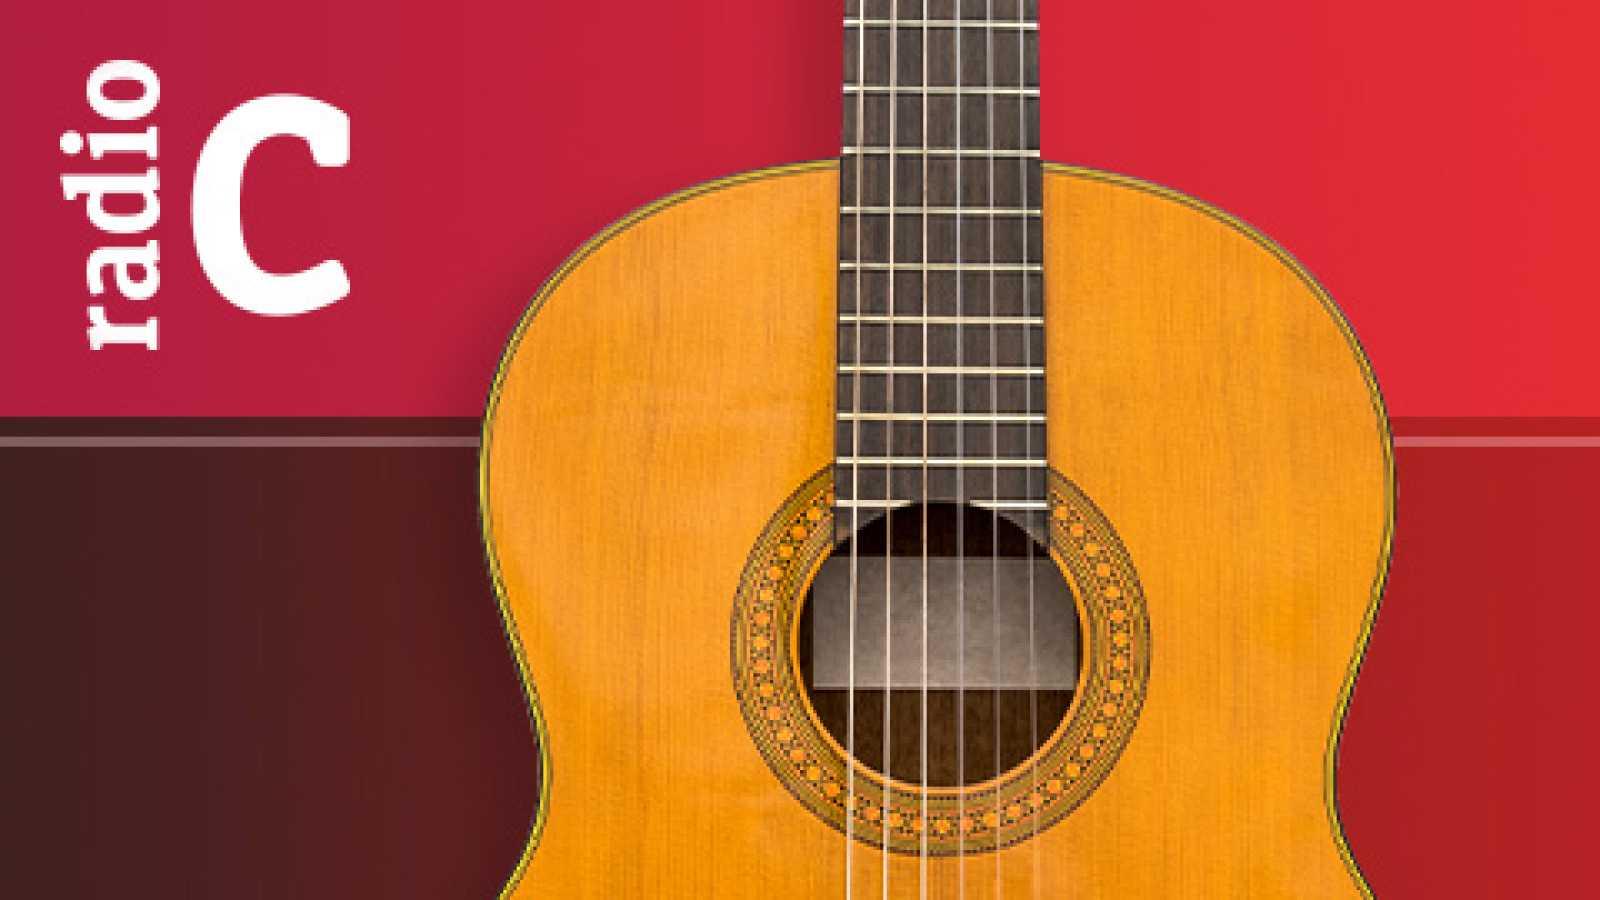 La guitarra - Eduardo Falú - 20/10/13 - escuchar ahora